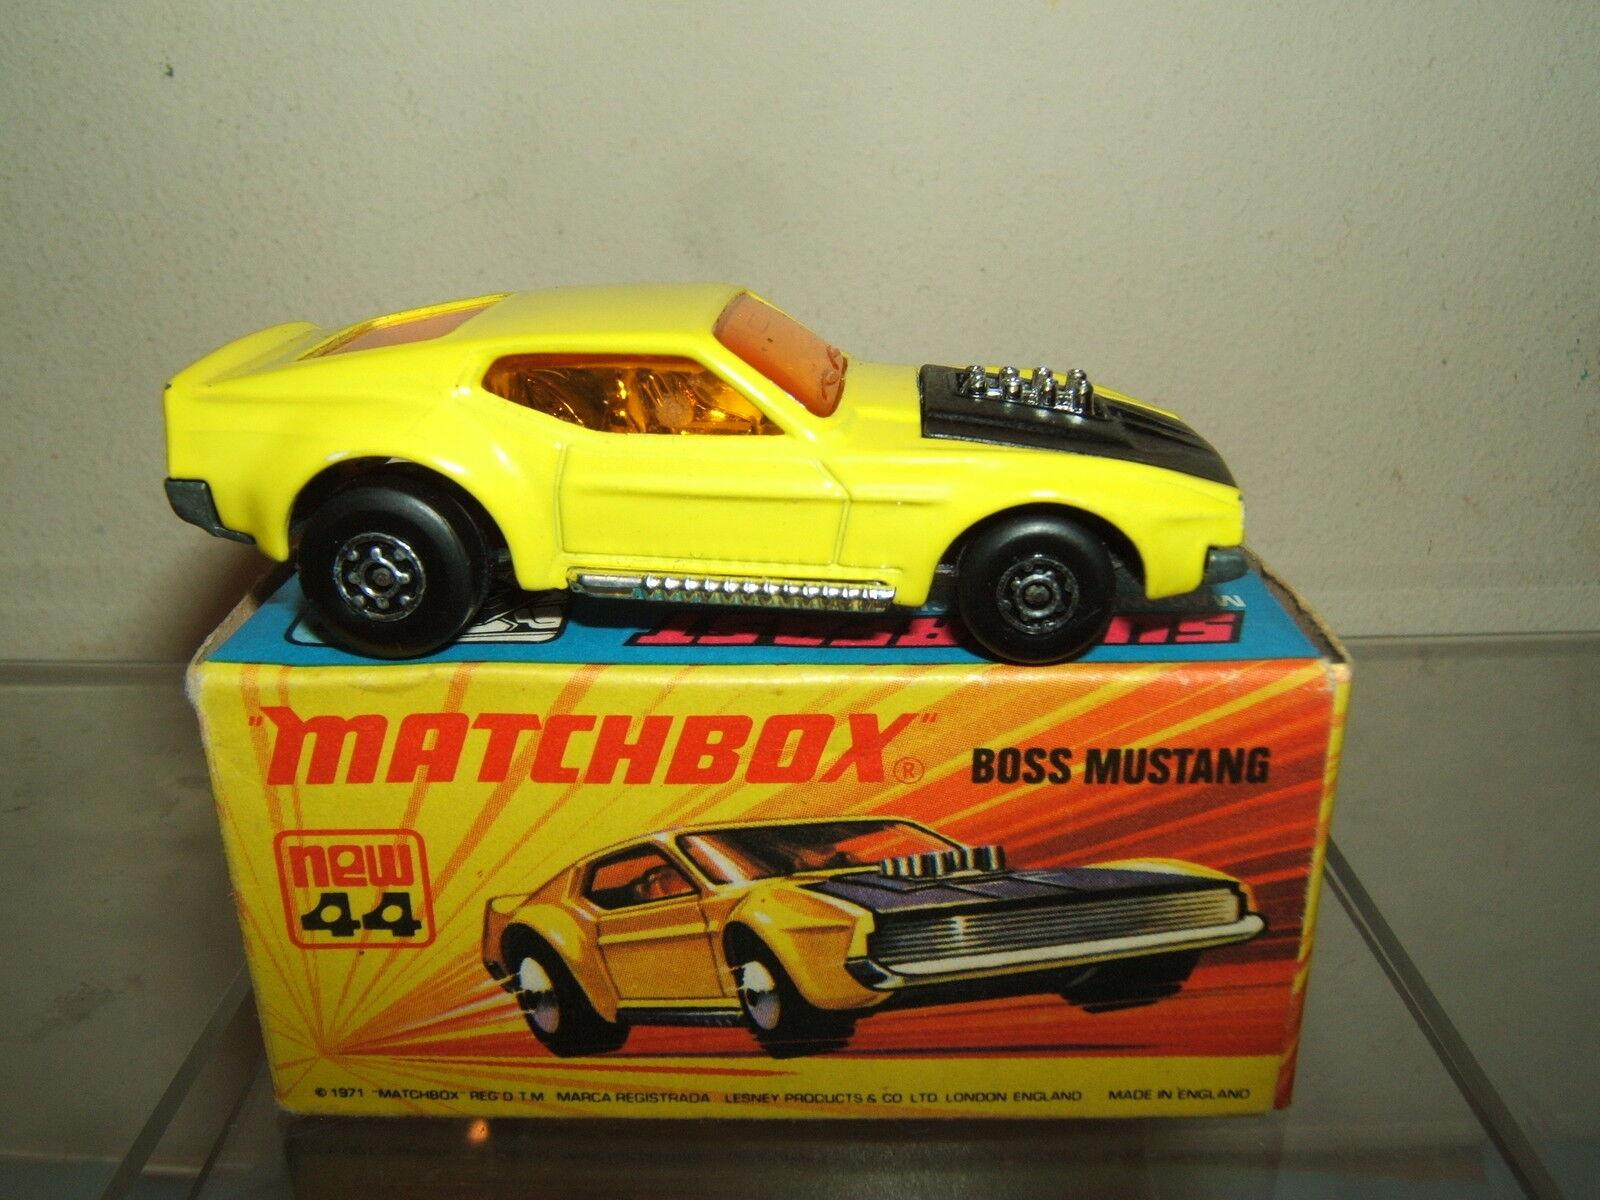 Matchbox superfast model No.44b boss mustang vn mib